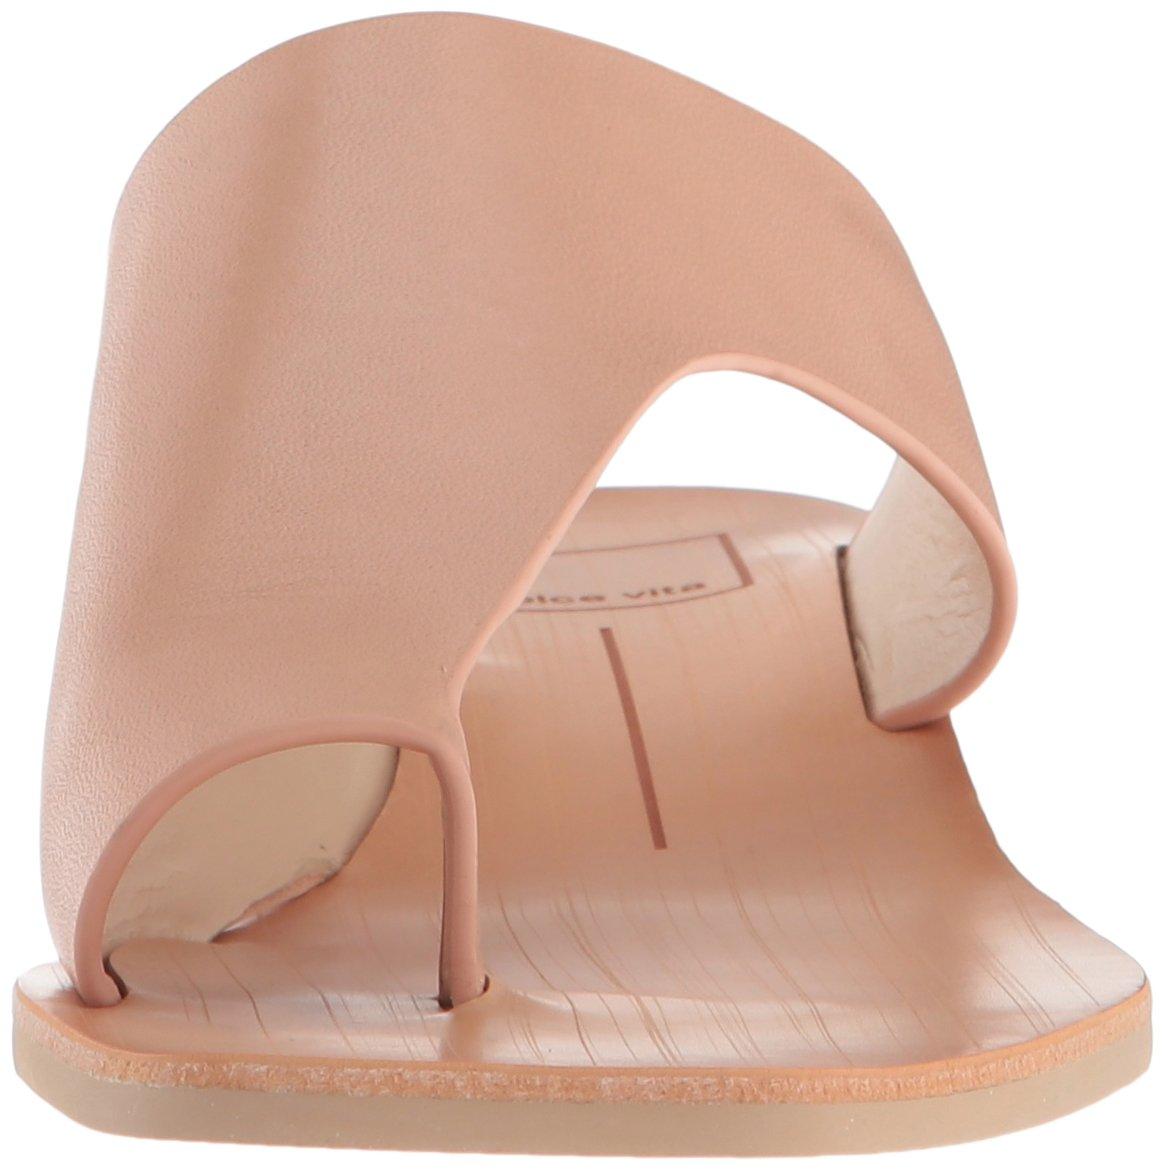 Dolce Vita Women's Hazle Slide US|Natural Sandal B07B26723F 9 B(M) US|Natural Slide Leather 60a37e